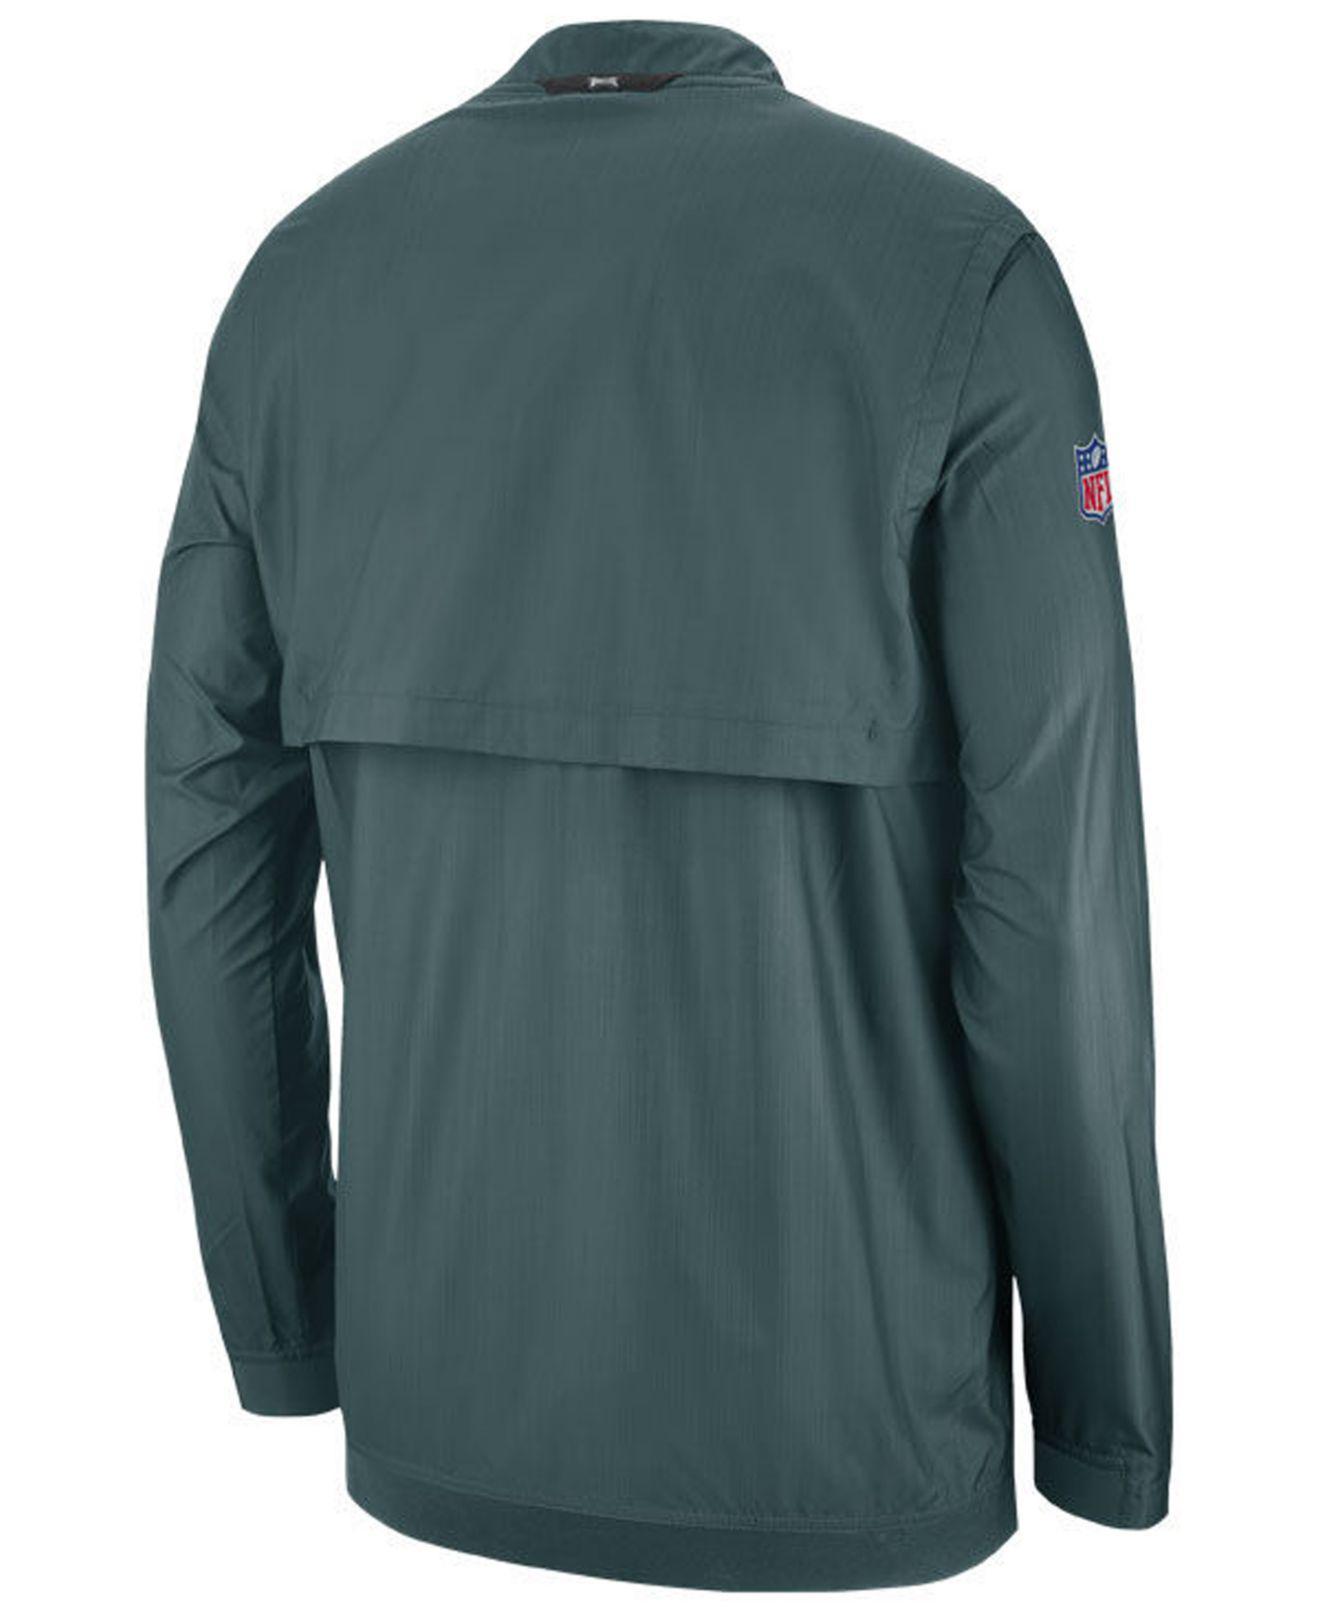 1c4f23546 Lyst - Nike Philadelphia Eagles Lockdown Jacket in Green for Men